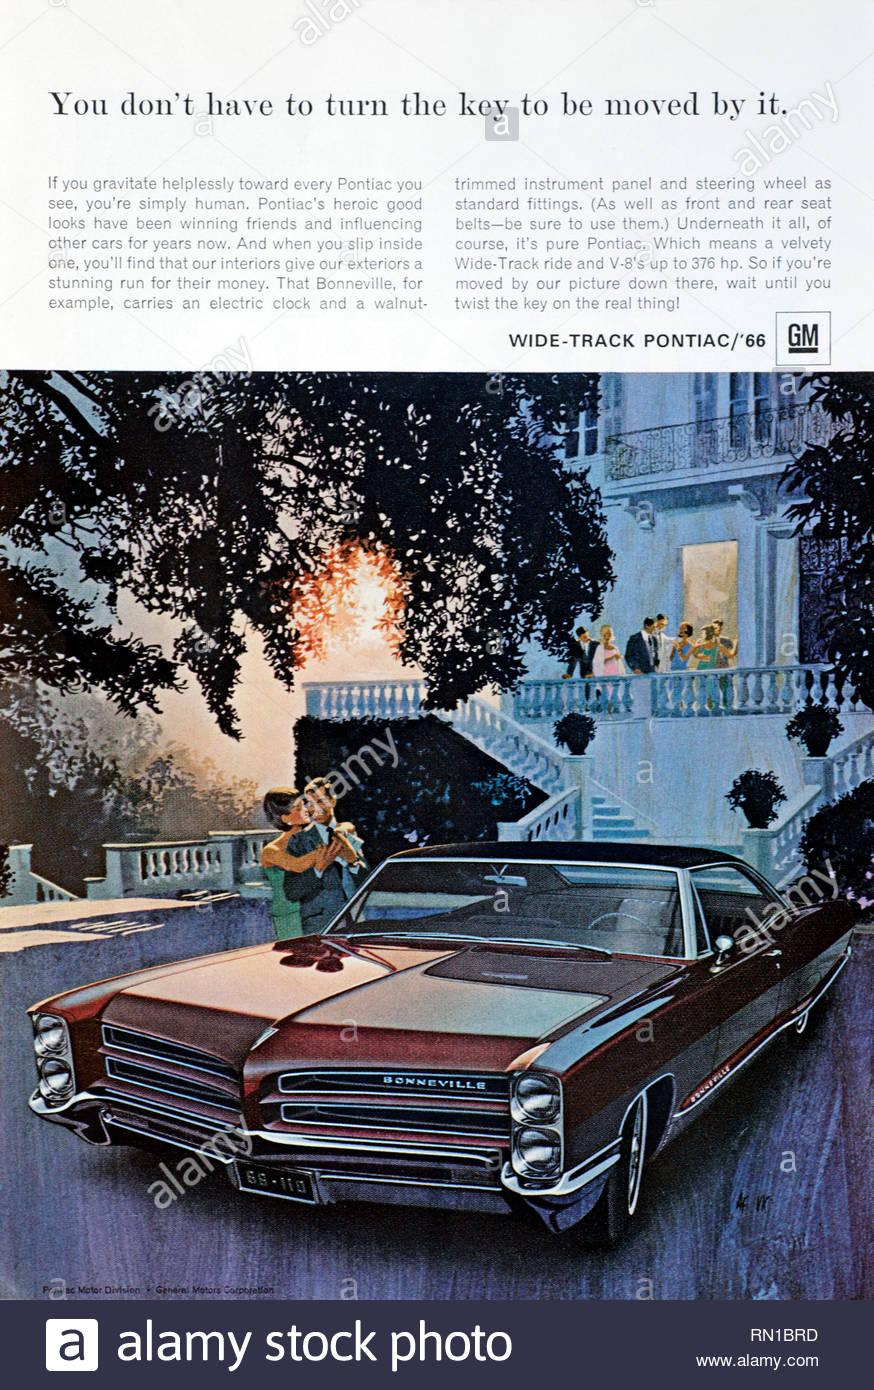 Vintage advertising for the  Pontiac Bonneville Wide track Car 1966 - Stock Image